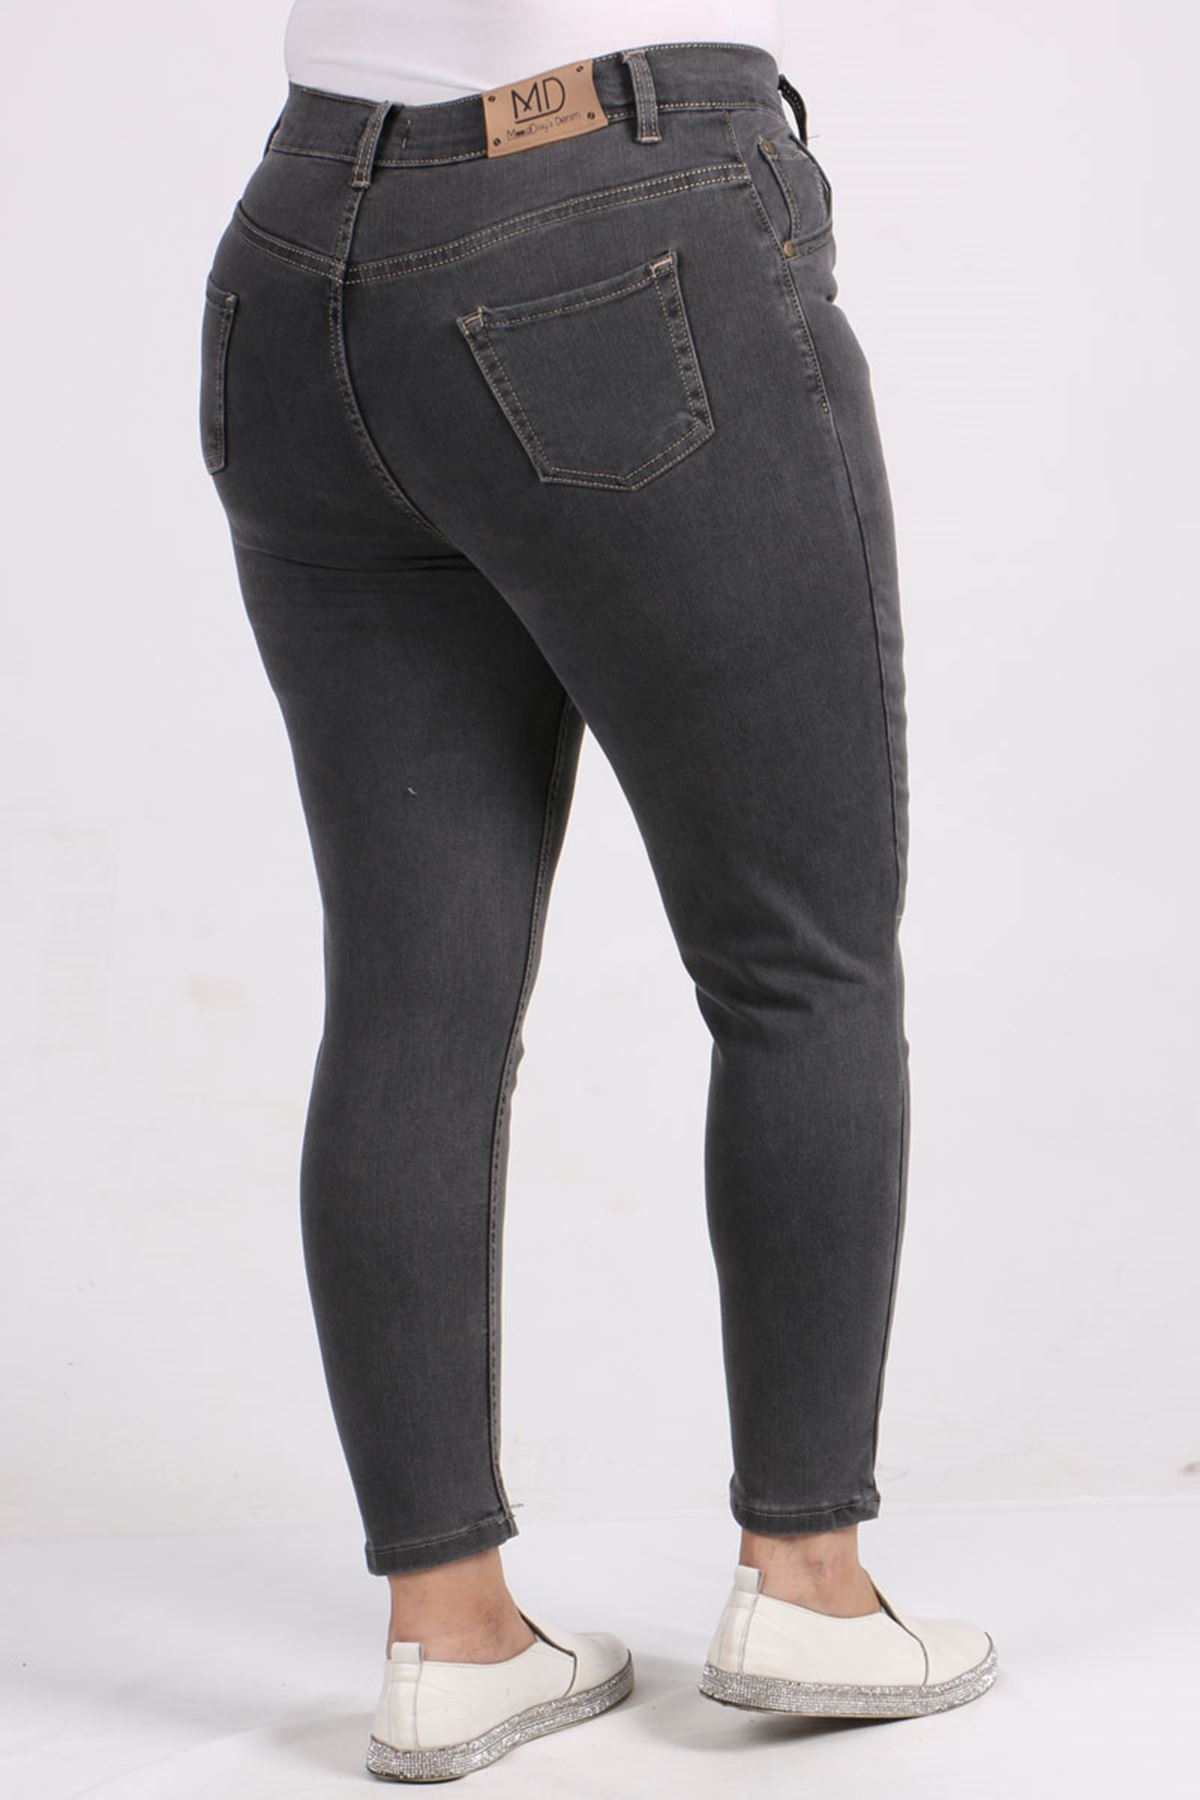 9107-1 Büyük Beden Dar Paça Kot Pantalon-Antrasit